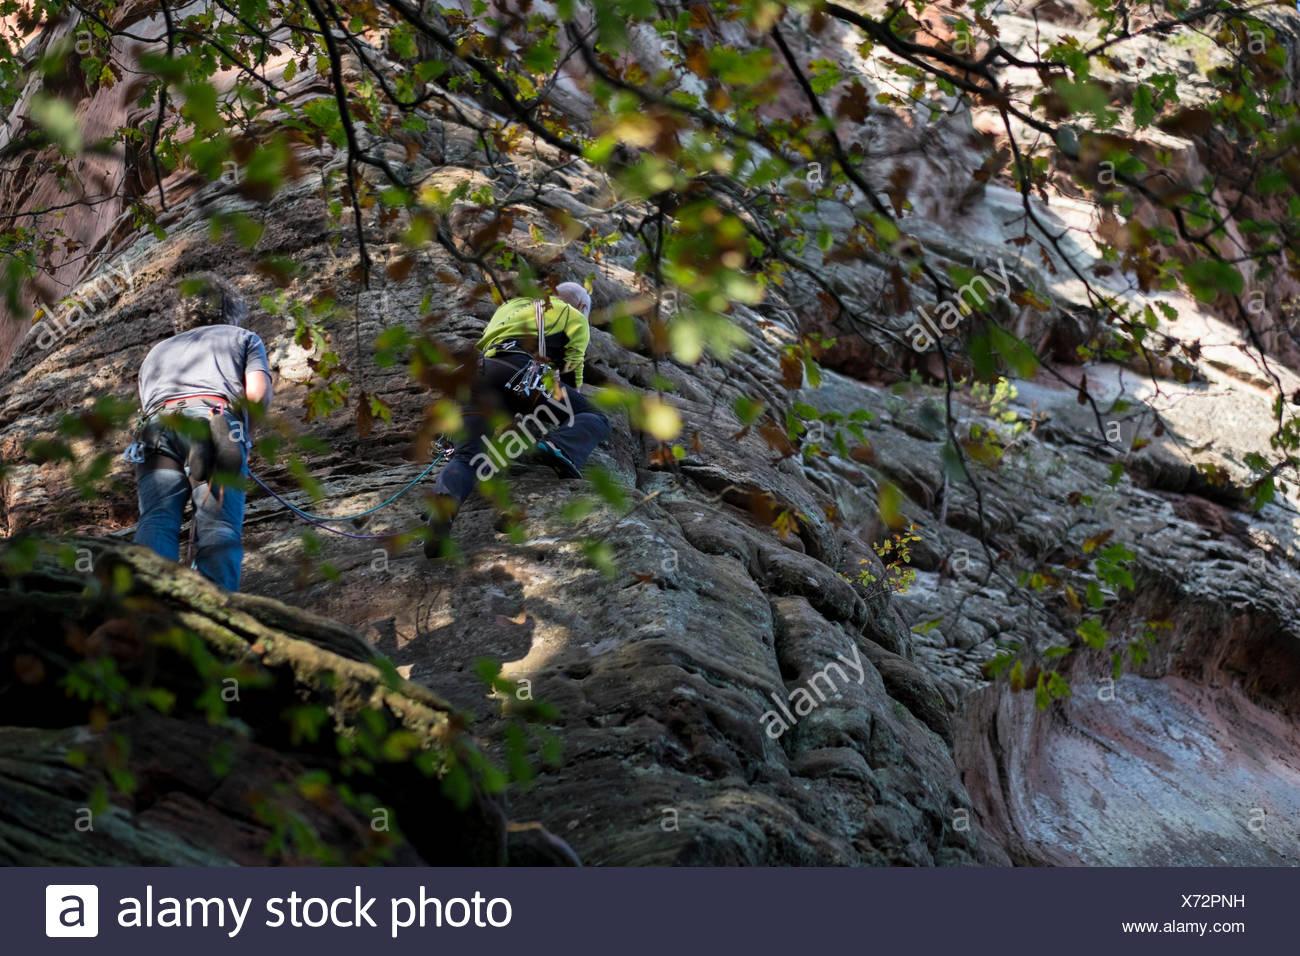 Climber at the PK edge on the Hochsteinnadel, Dahner Felsenland, Palatine Forest, Rhineland-Palatinate, Germany, - Stock Image